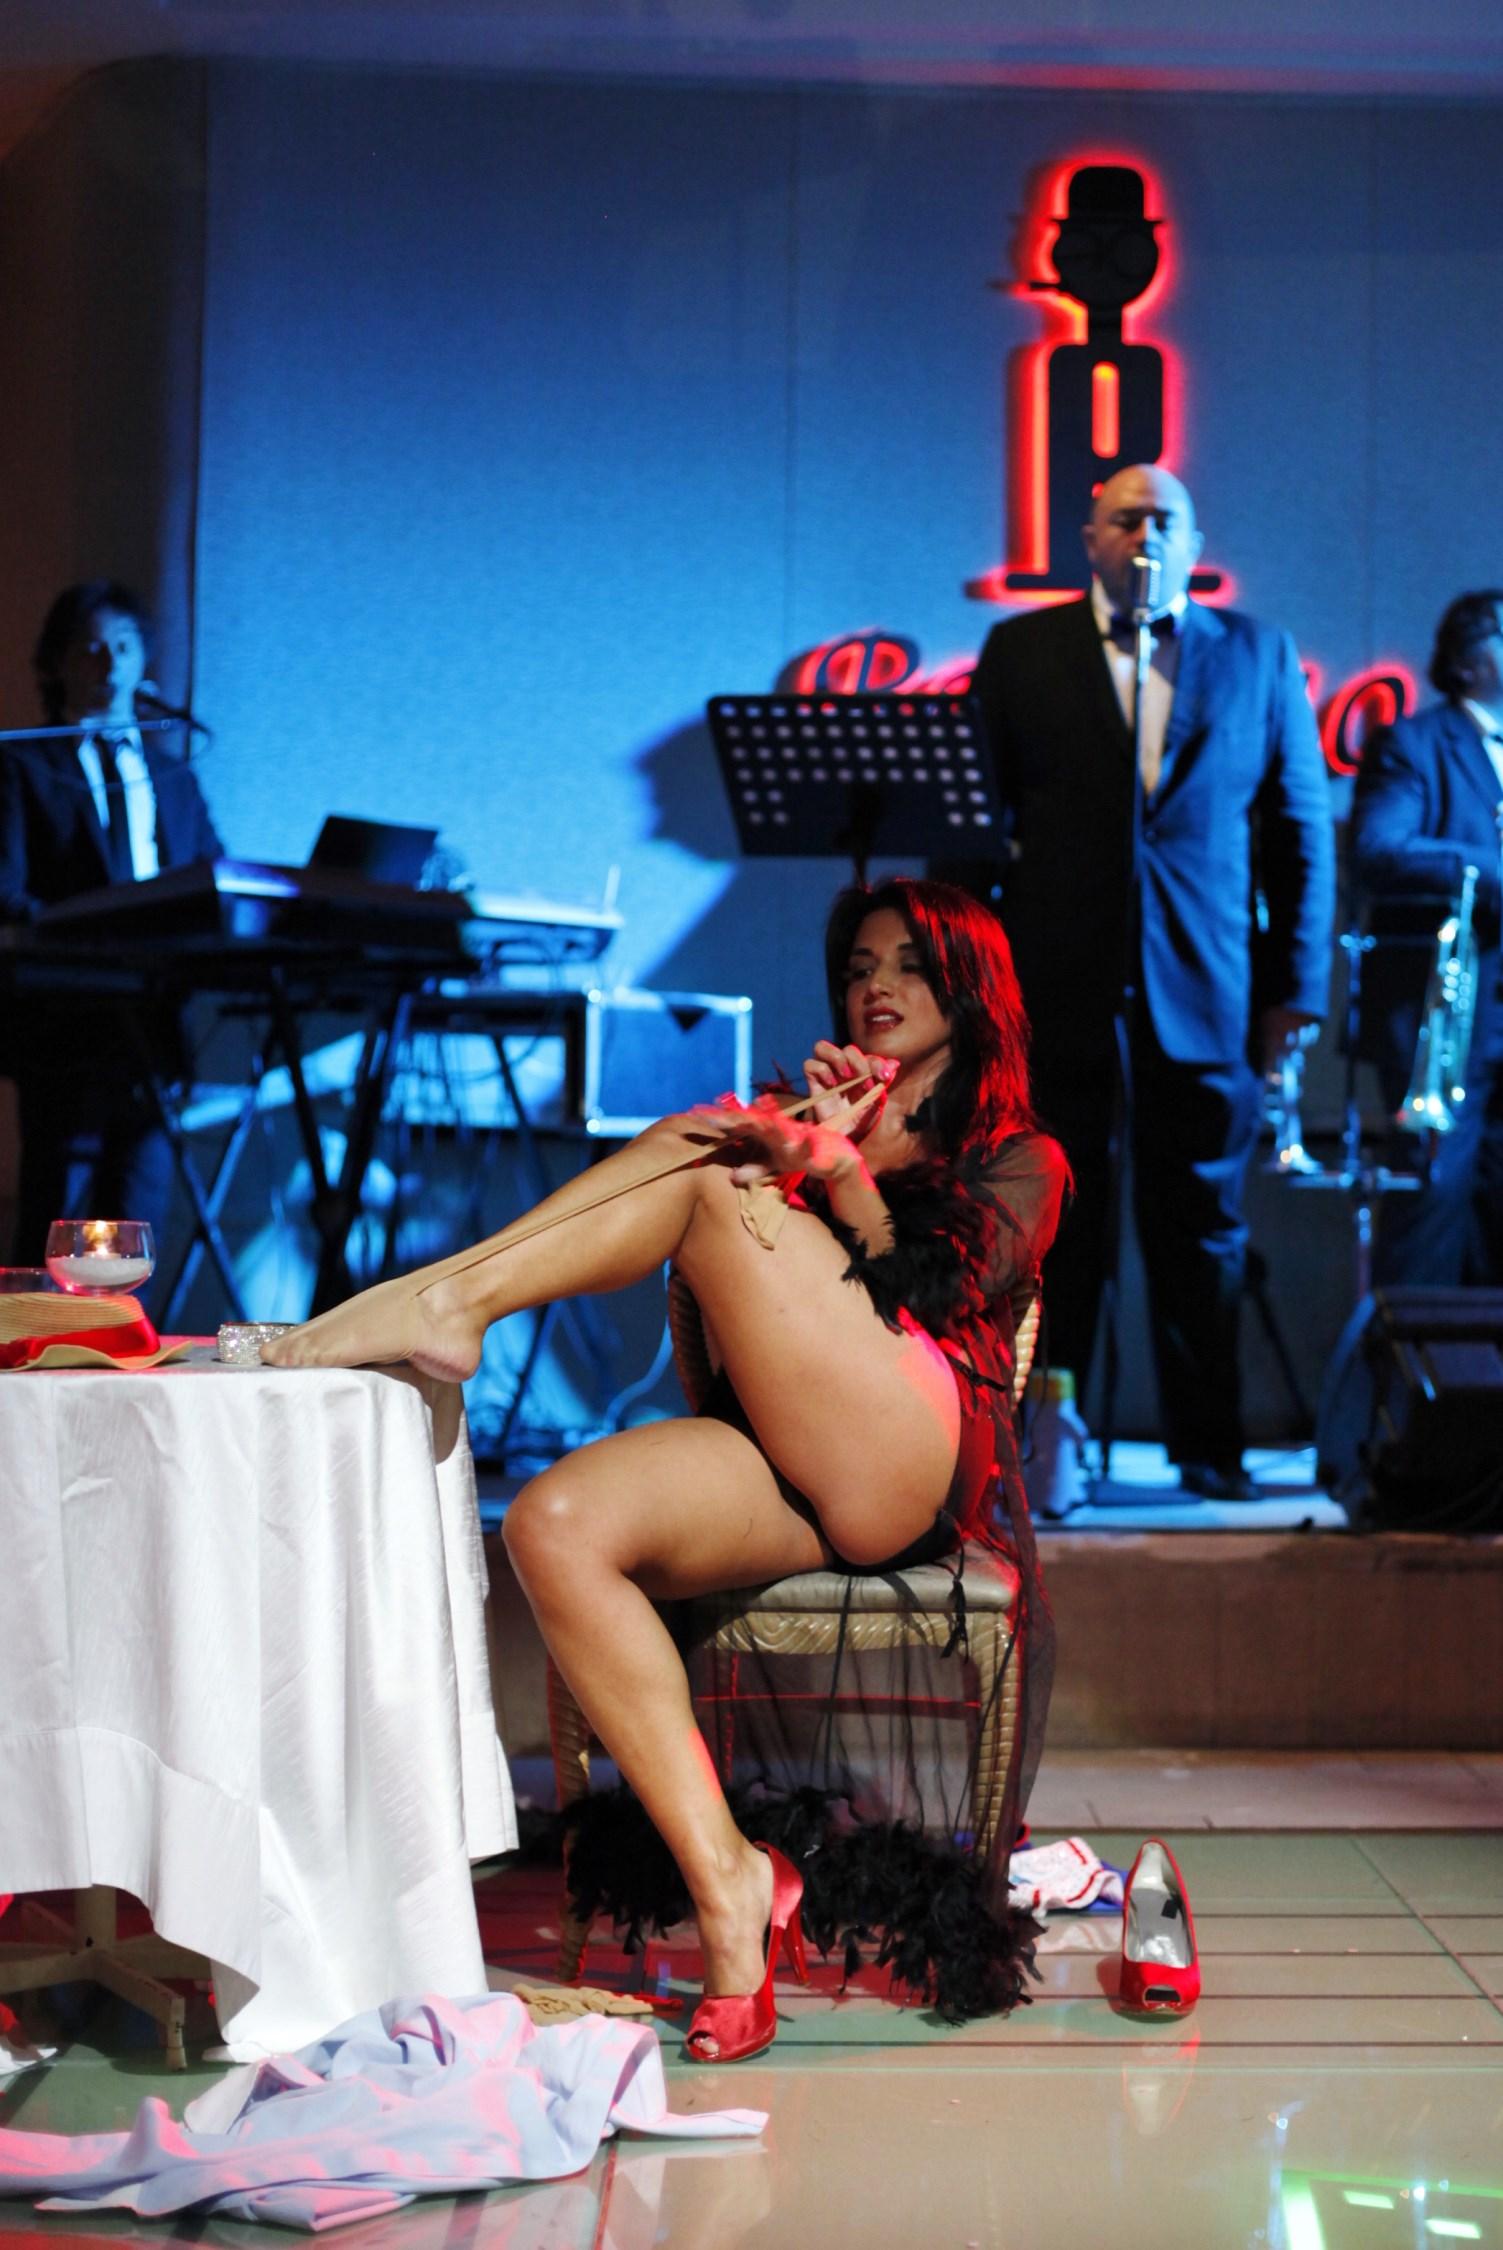 rosolino ristorante Claudia letizia performer attrice grande fratello gieffina burlesque lady letizia